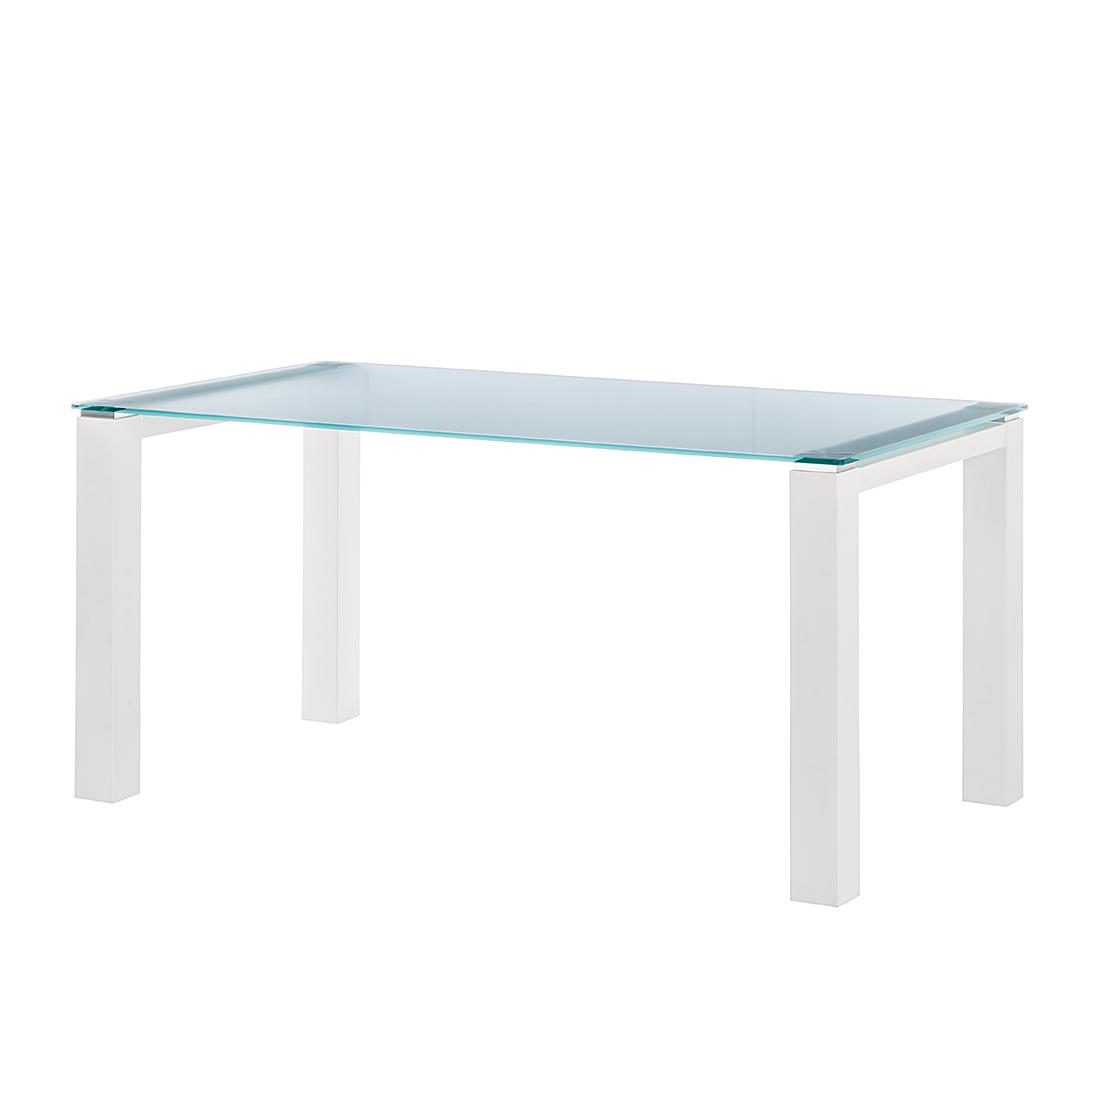 Niehoff Glazen tafel Palma - gesatineerd glas/wit gelakt (Afmetingen: 200x100cm) Home24